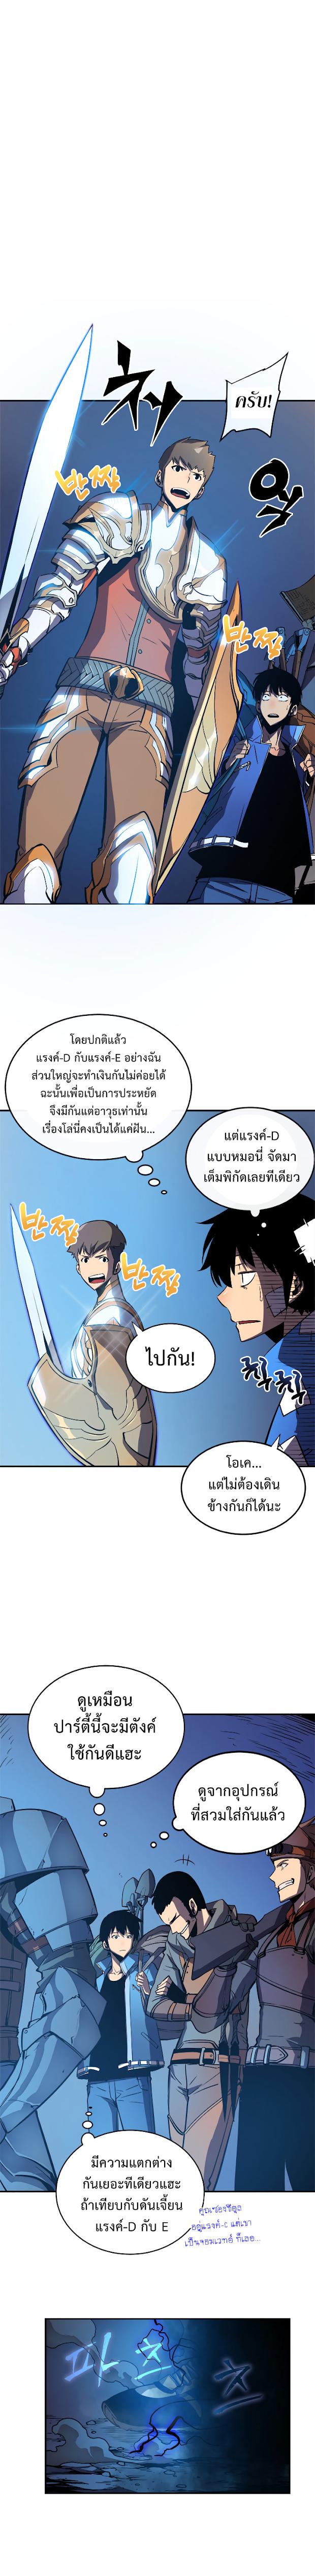 Solo Leveling ตอนที่ 19 TH แปลไทย